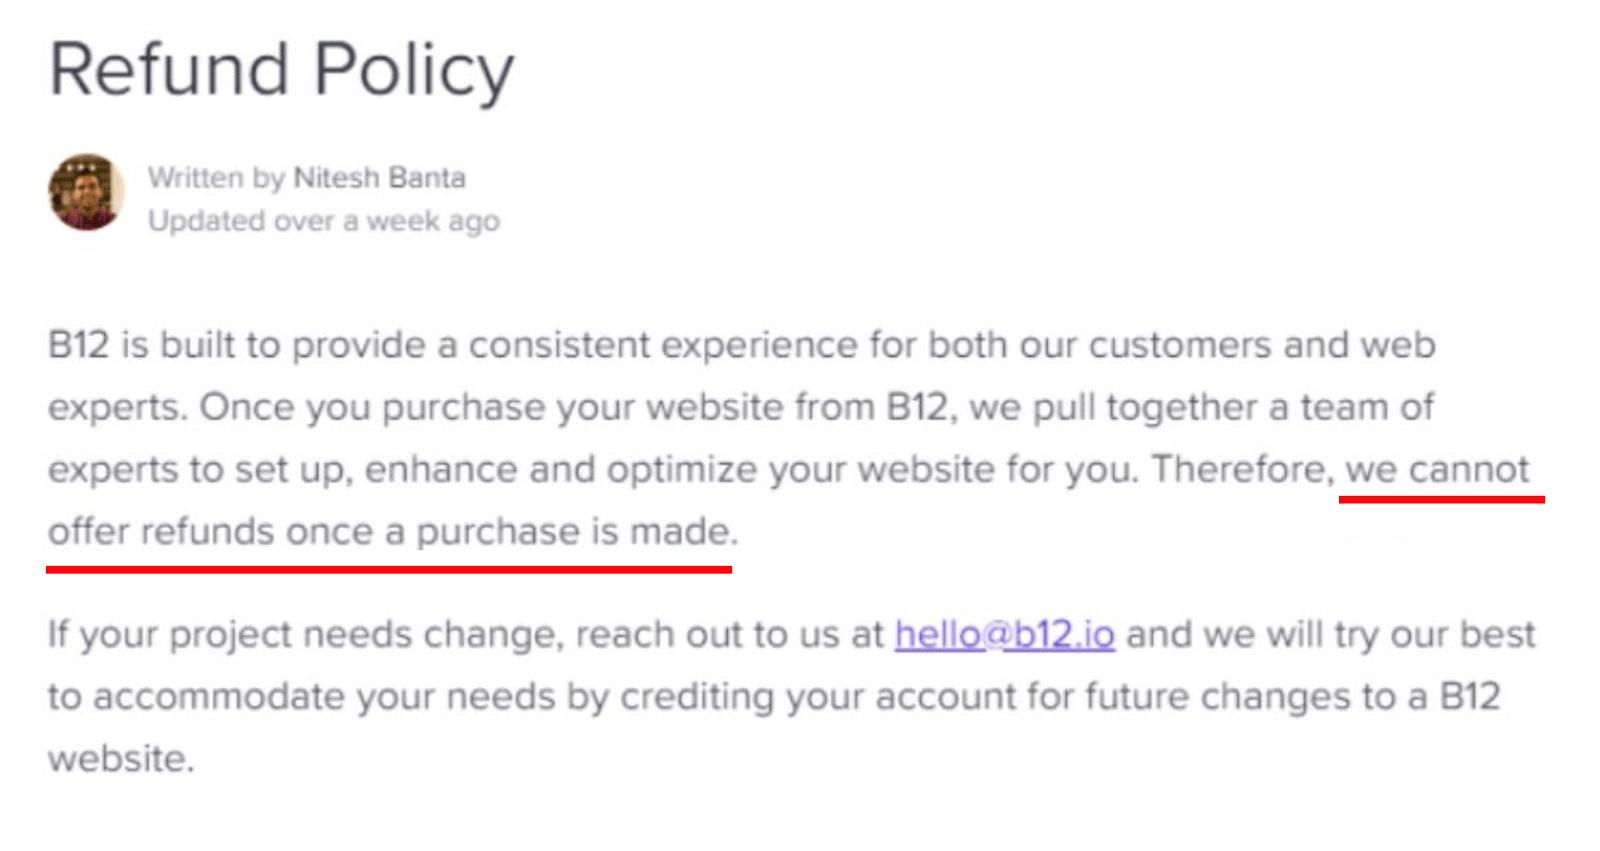 B12 Refund Policy